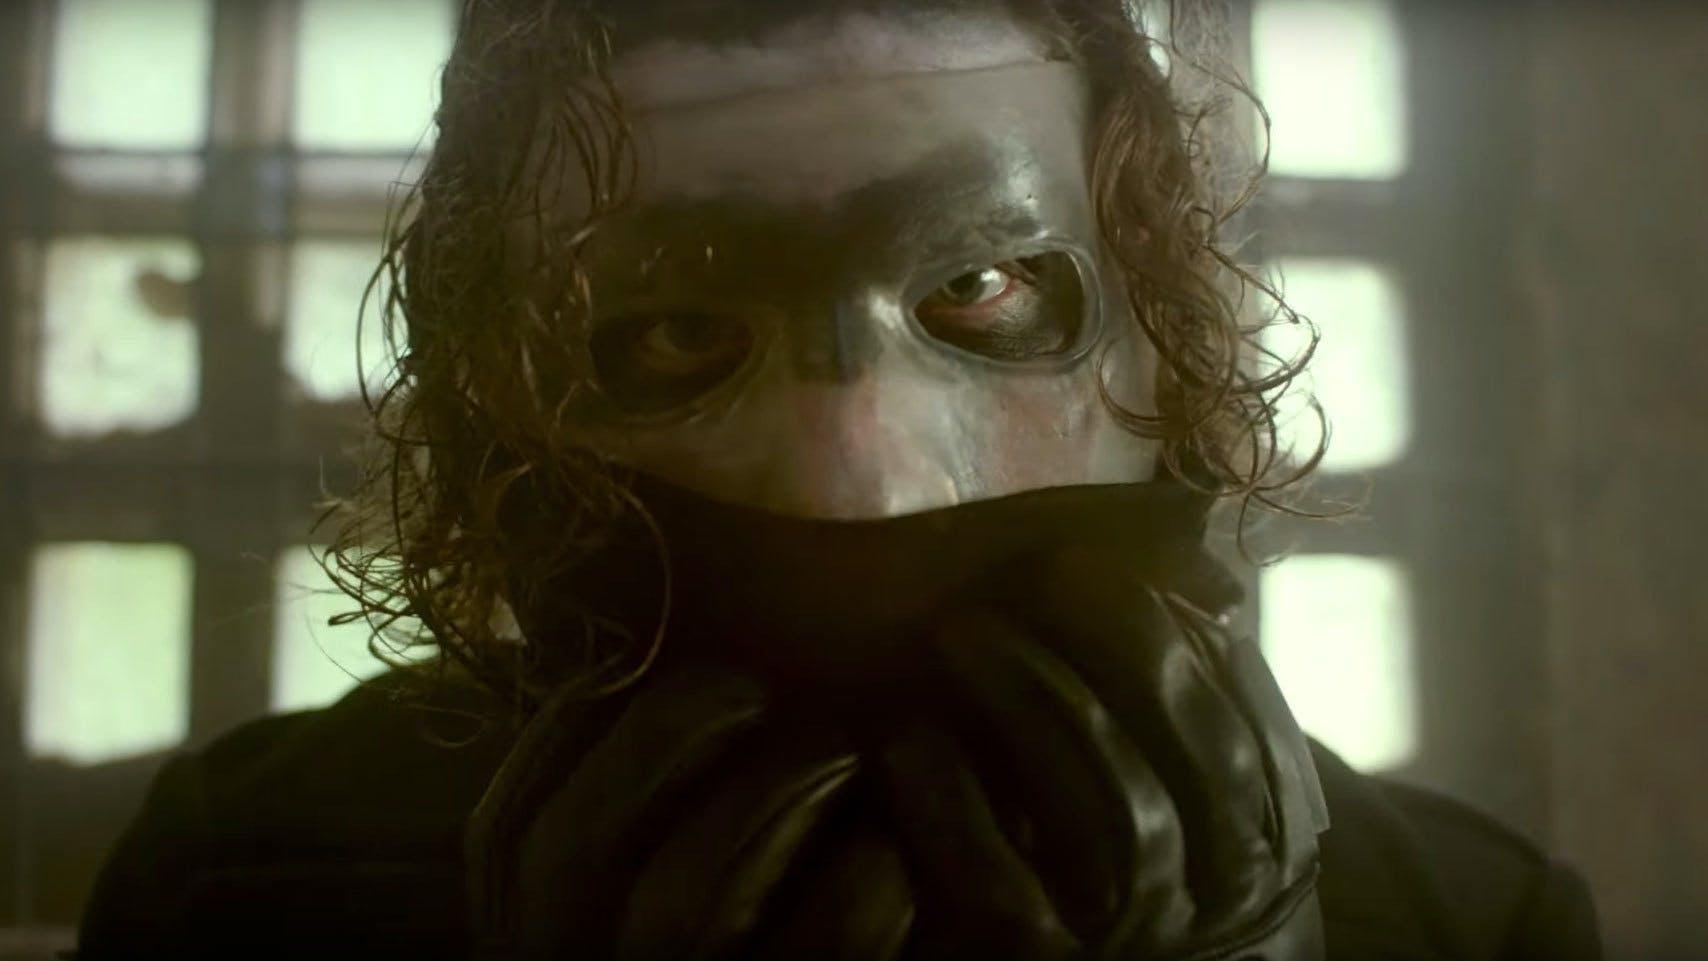 Slipknot's Unsainted video